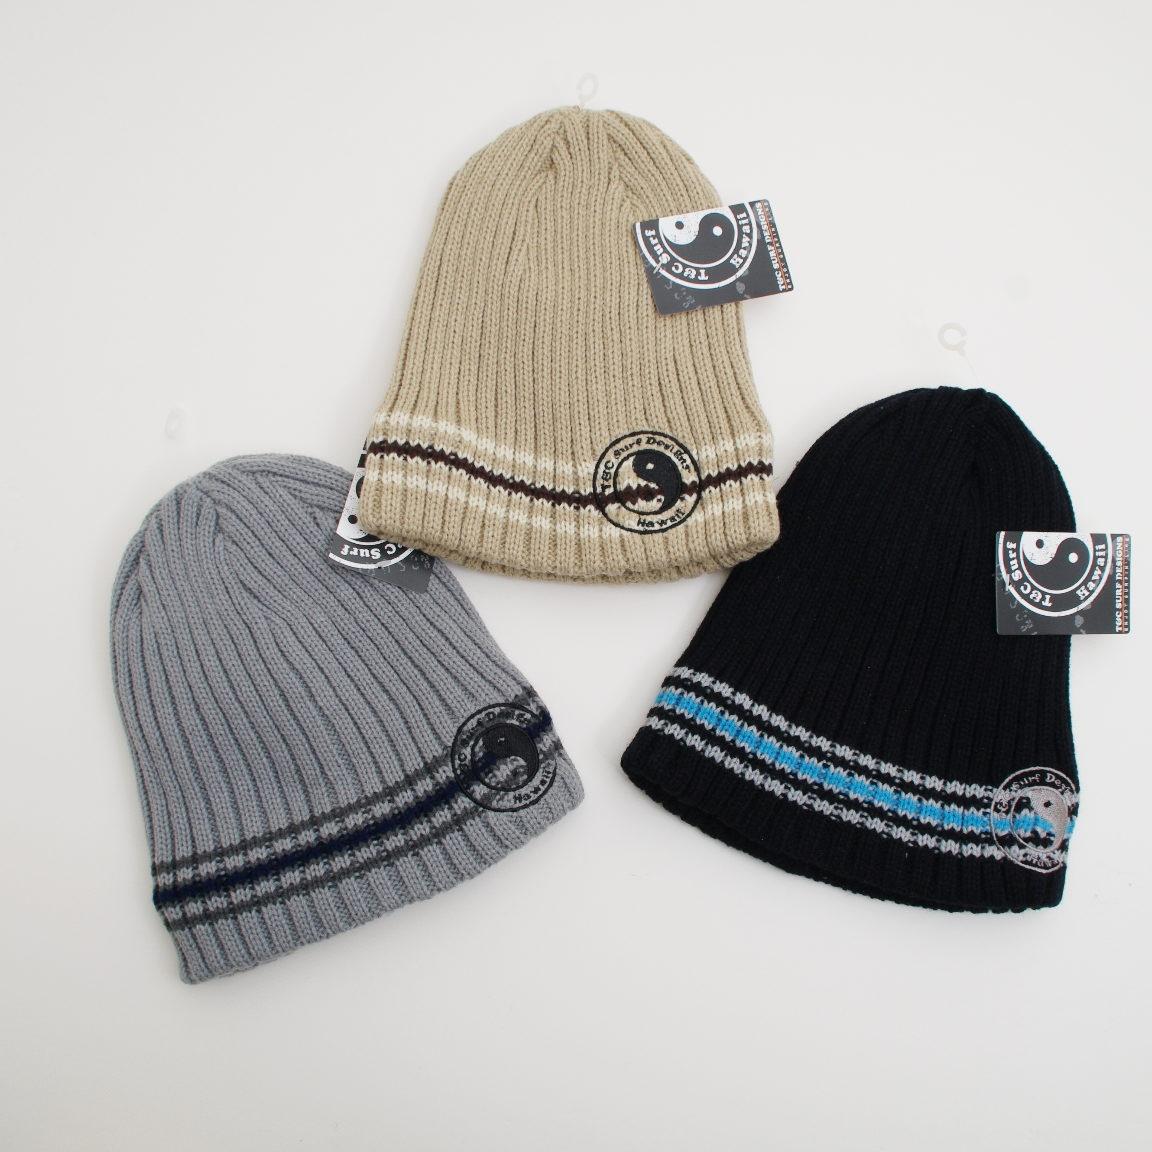 T&CSURF DESIGNS  メンズ ニット帽 紳士 帽子 TCW-01724-YK